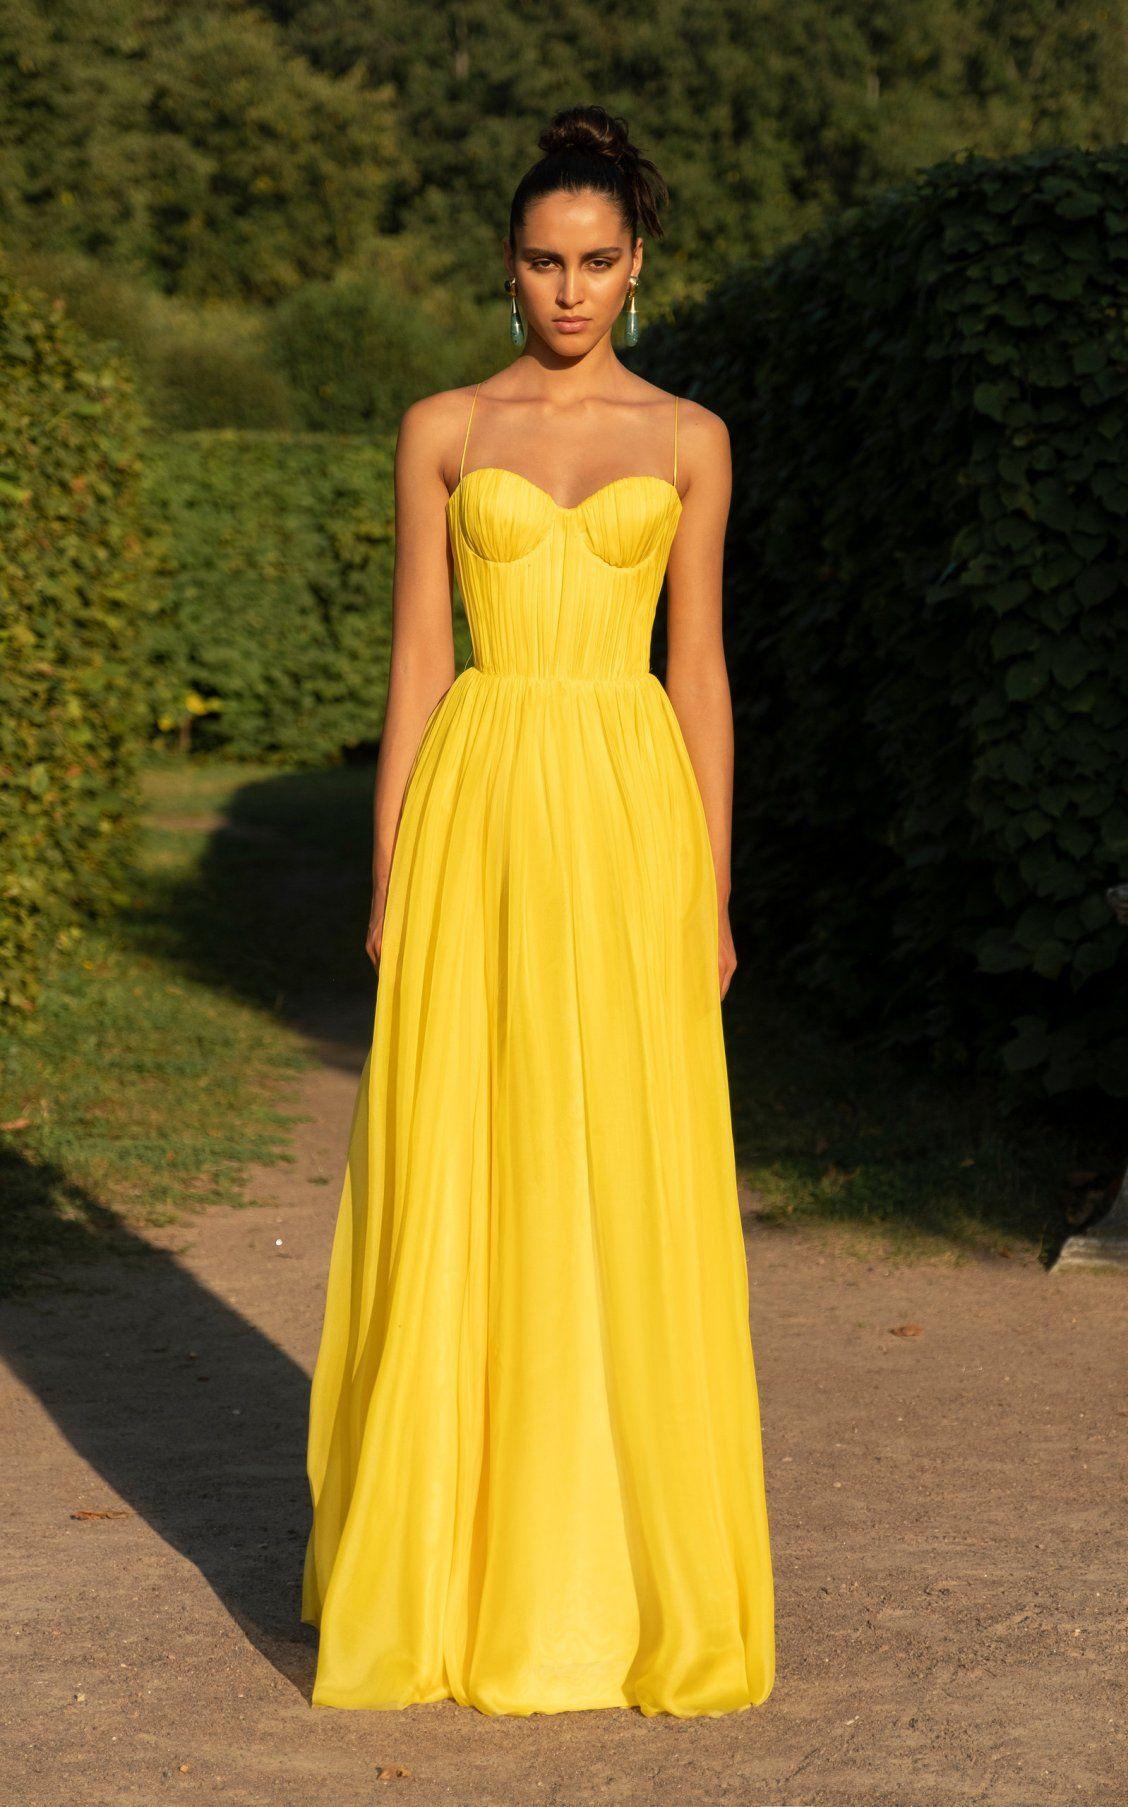 f77afd4aaa74 Empire-Waist Silk Gathered Gown by Rasario SS19 Abito Da Sposa Giallo